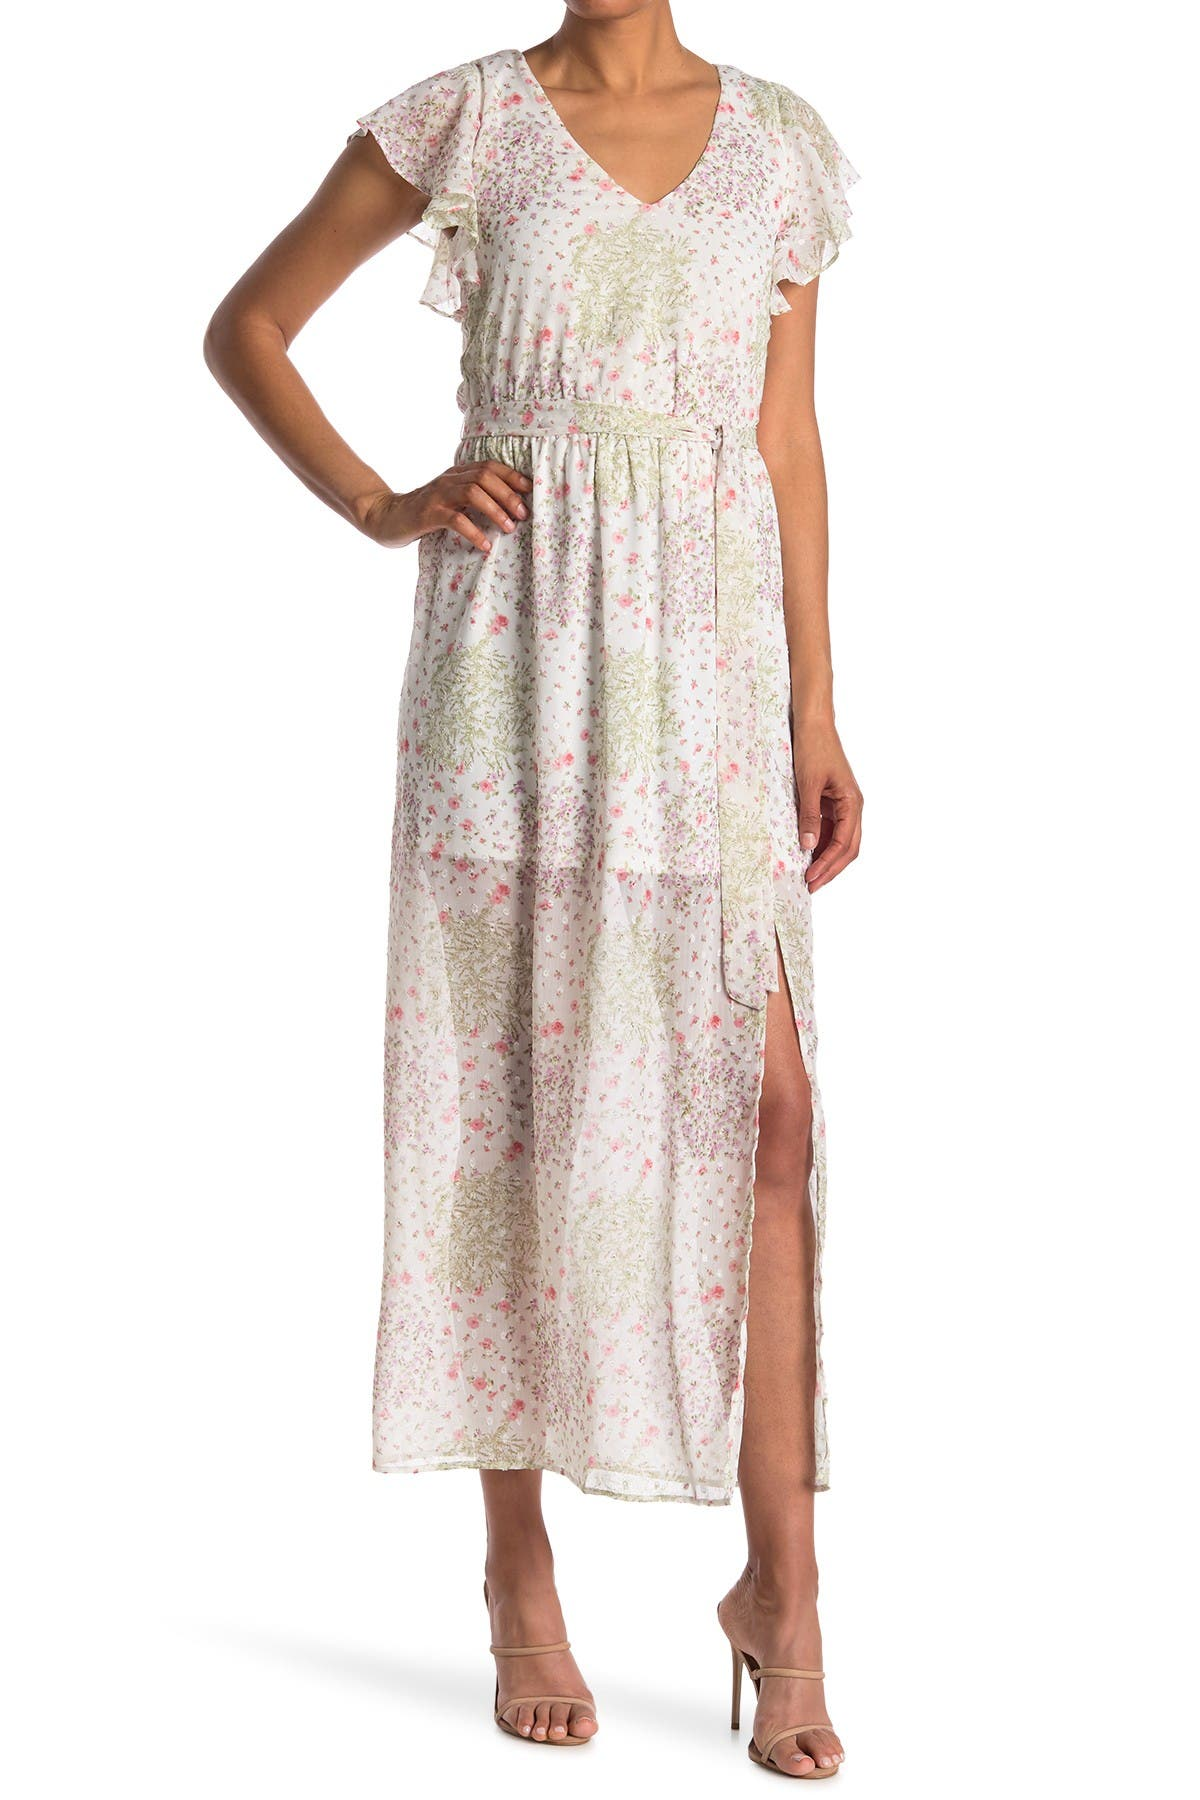 Image of KENEDIK Floral Clip Dot Short Sleeve Maxi Dress